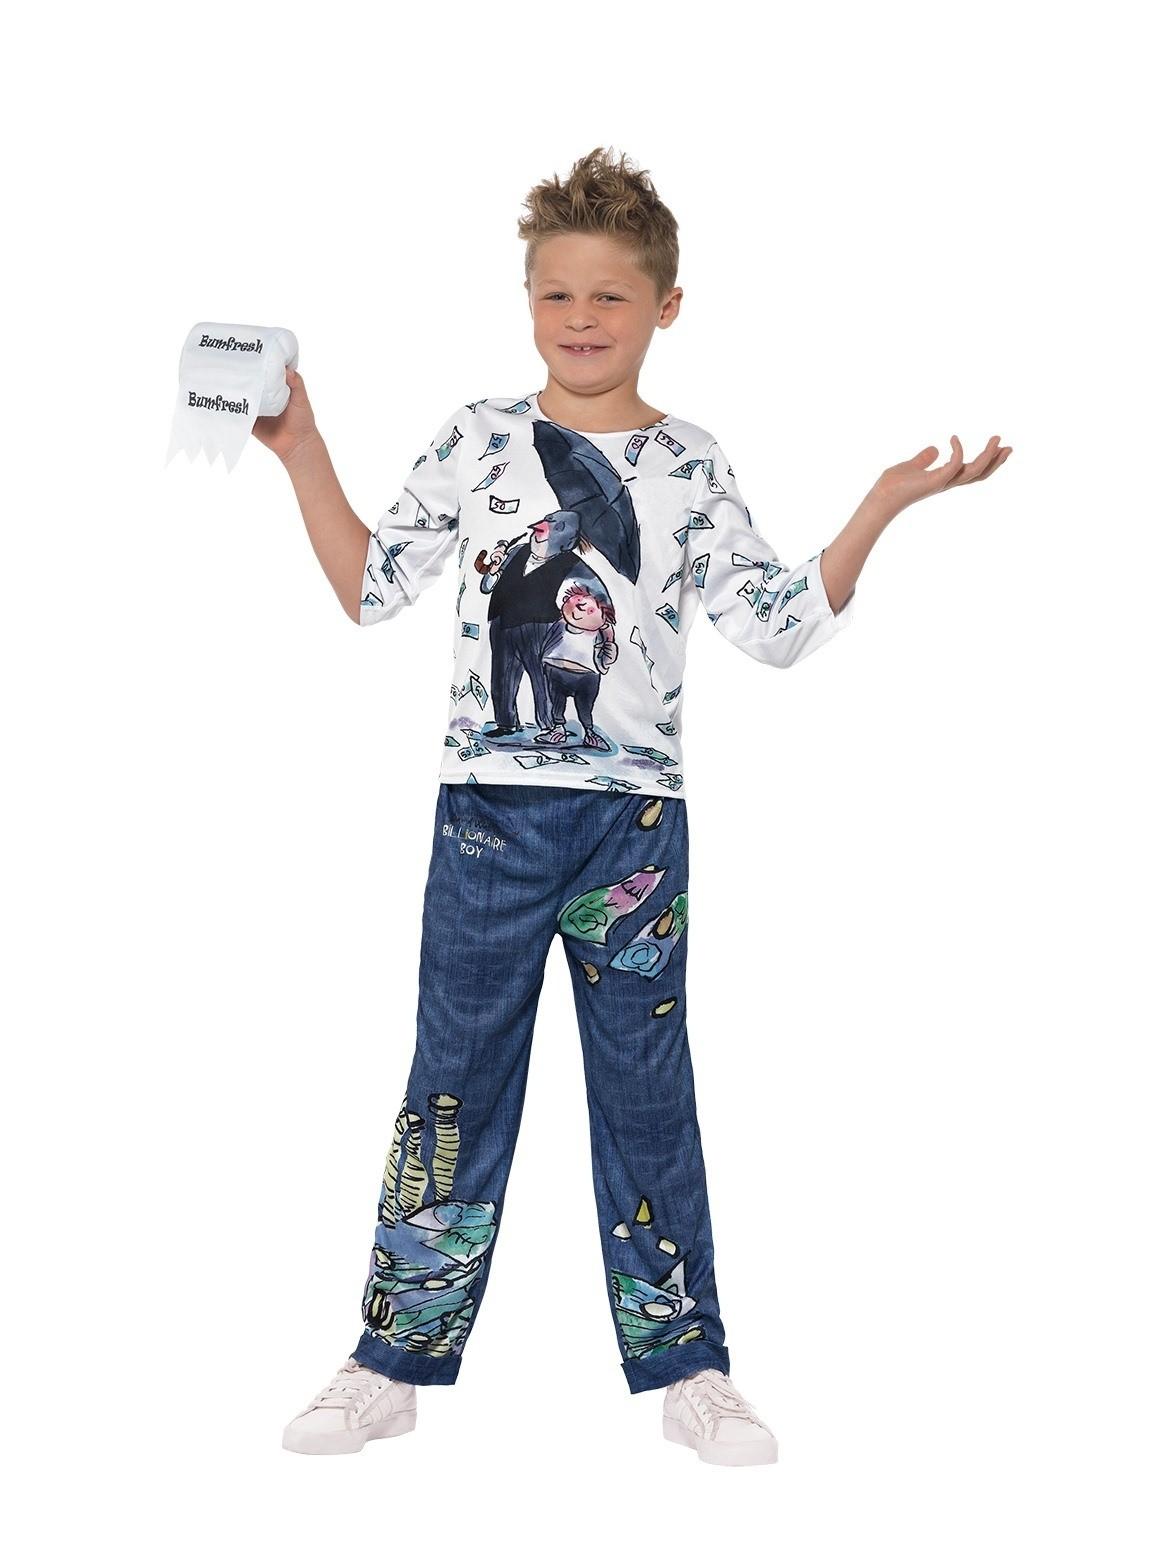 DAVID WALLIAMS COSTUME BOOK WEEK CHILDREN BOY DELUXE BILLIONAIRE BOY COSTUME